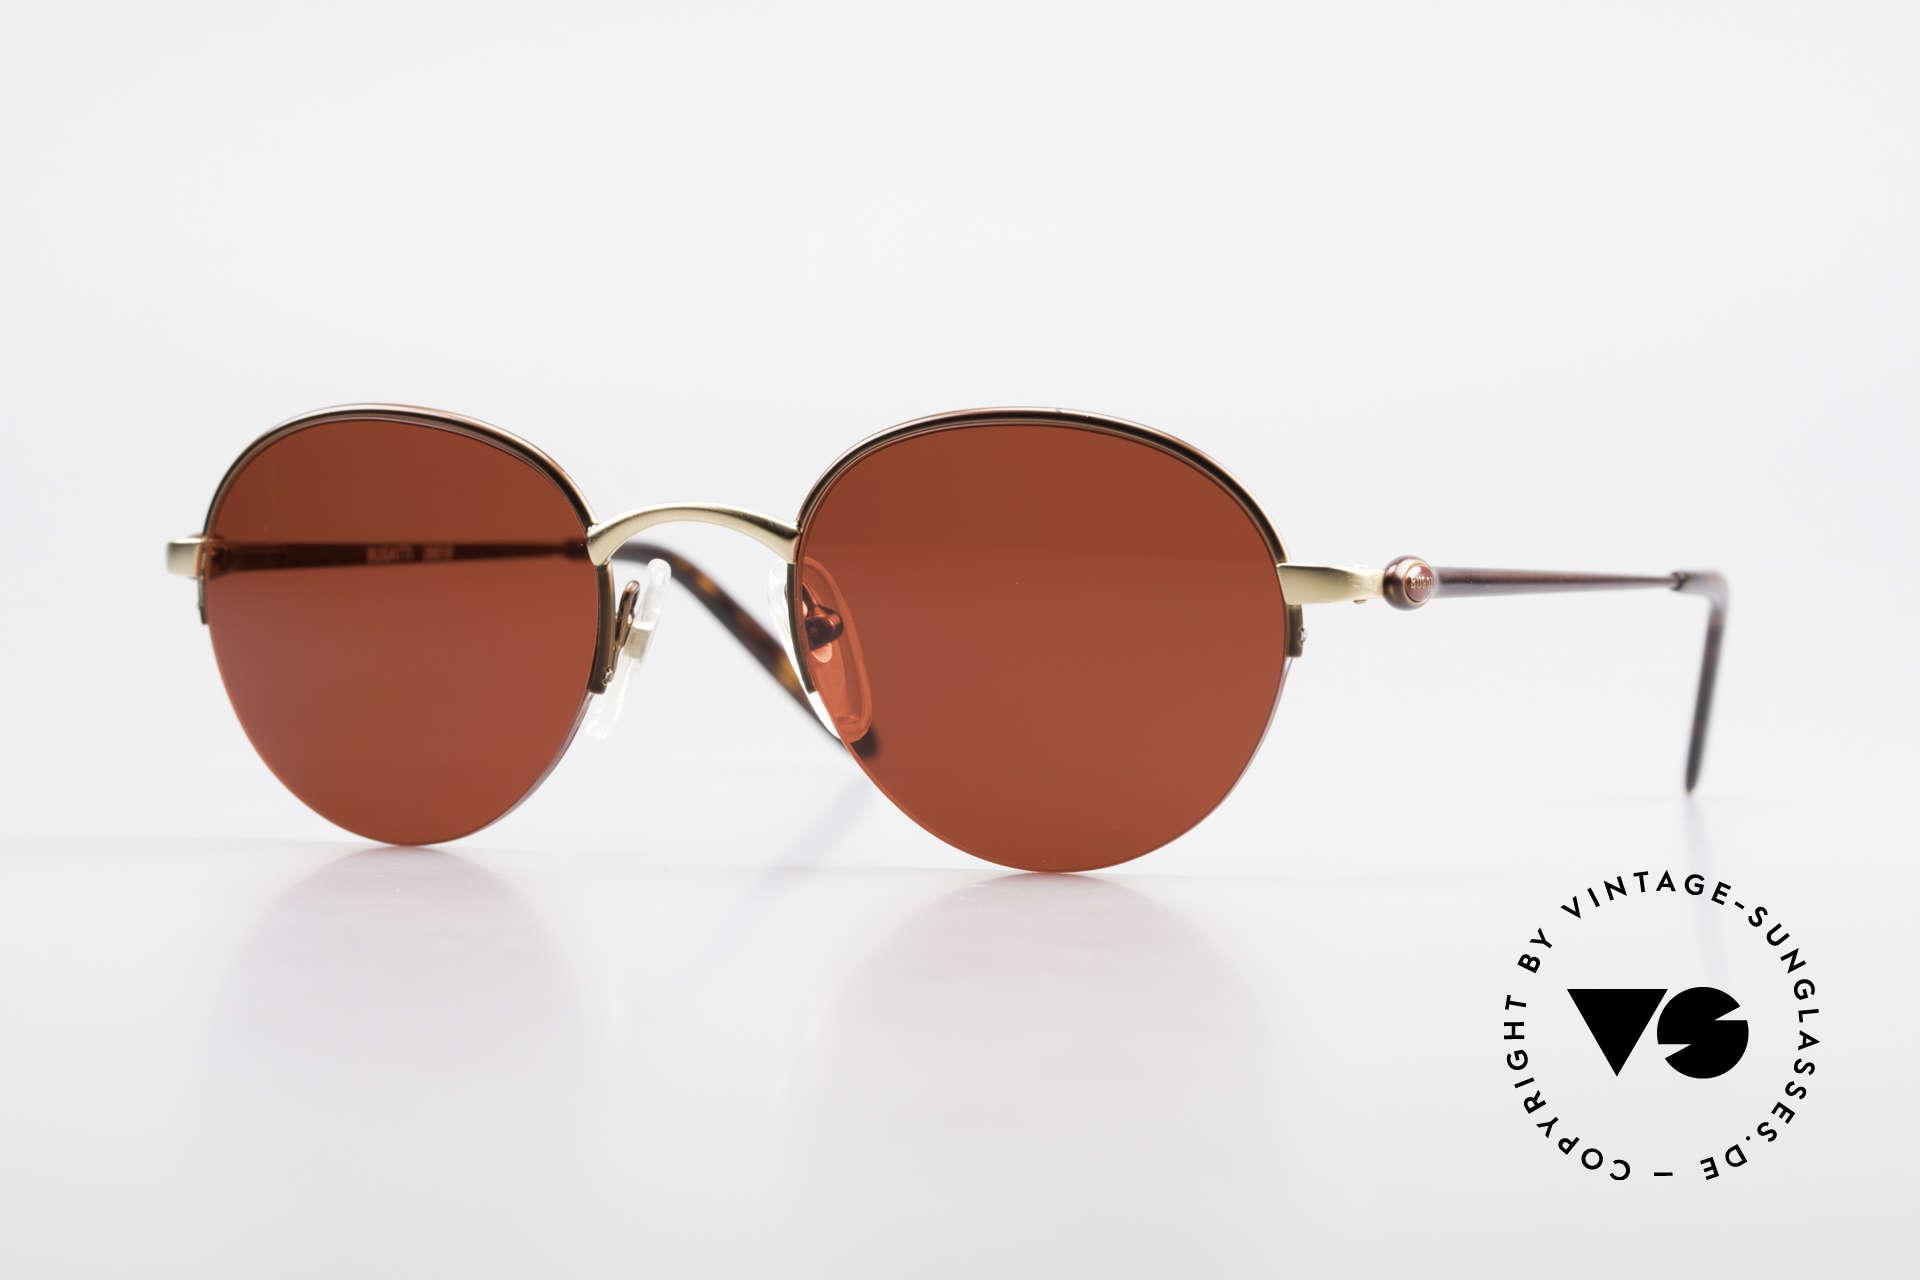 Bugatti 26619 Runde Bugatti Panto Brille, seltene Bugatti Panto-Sonnenbrille; Gr. 49-21, Passend für Herren